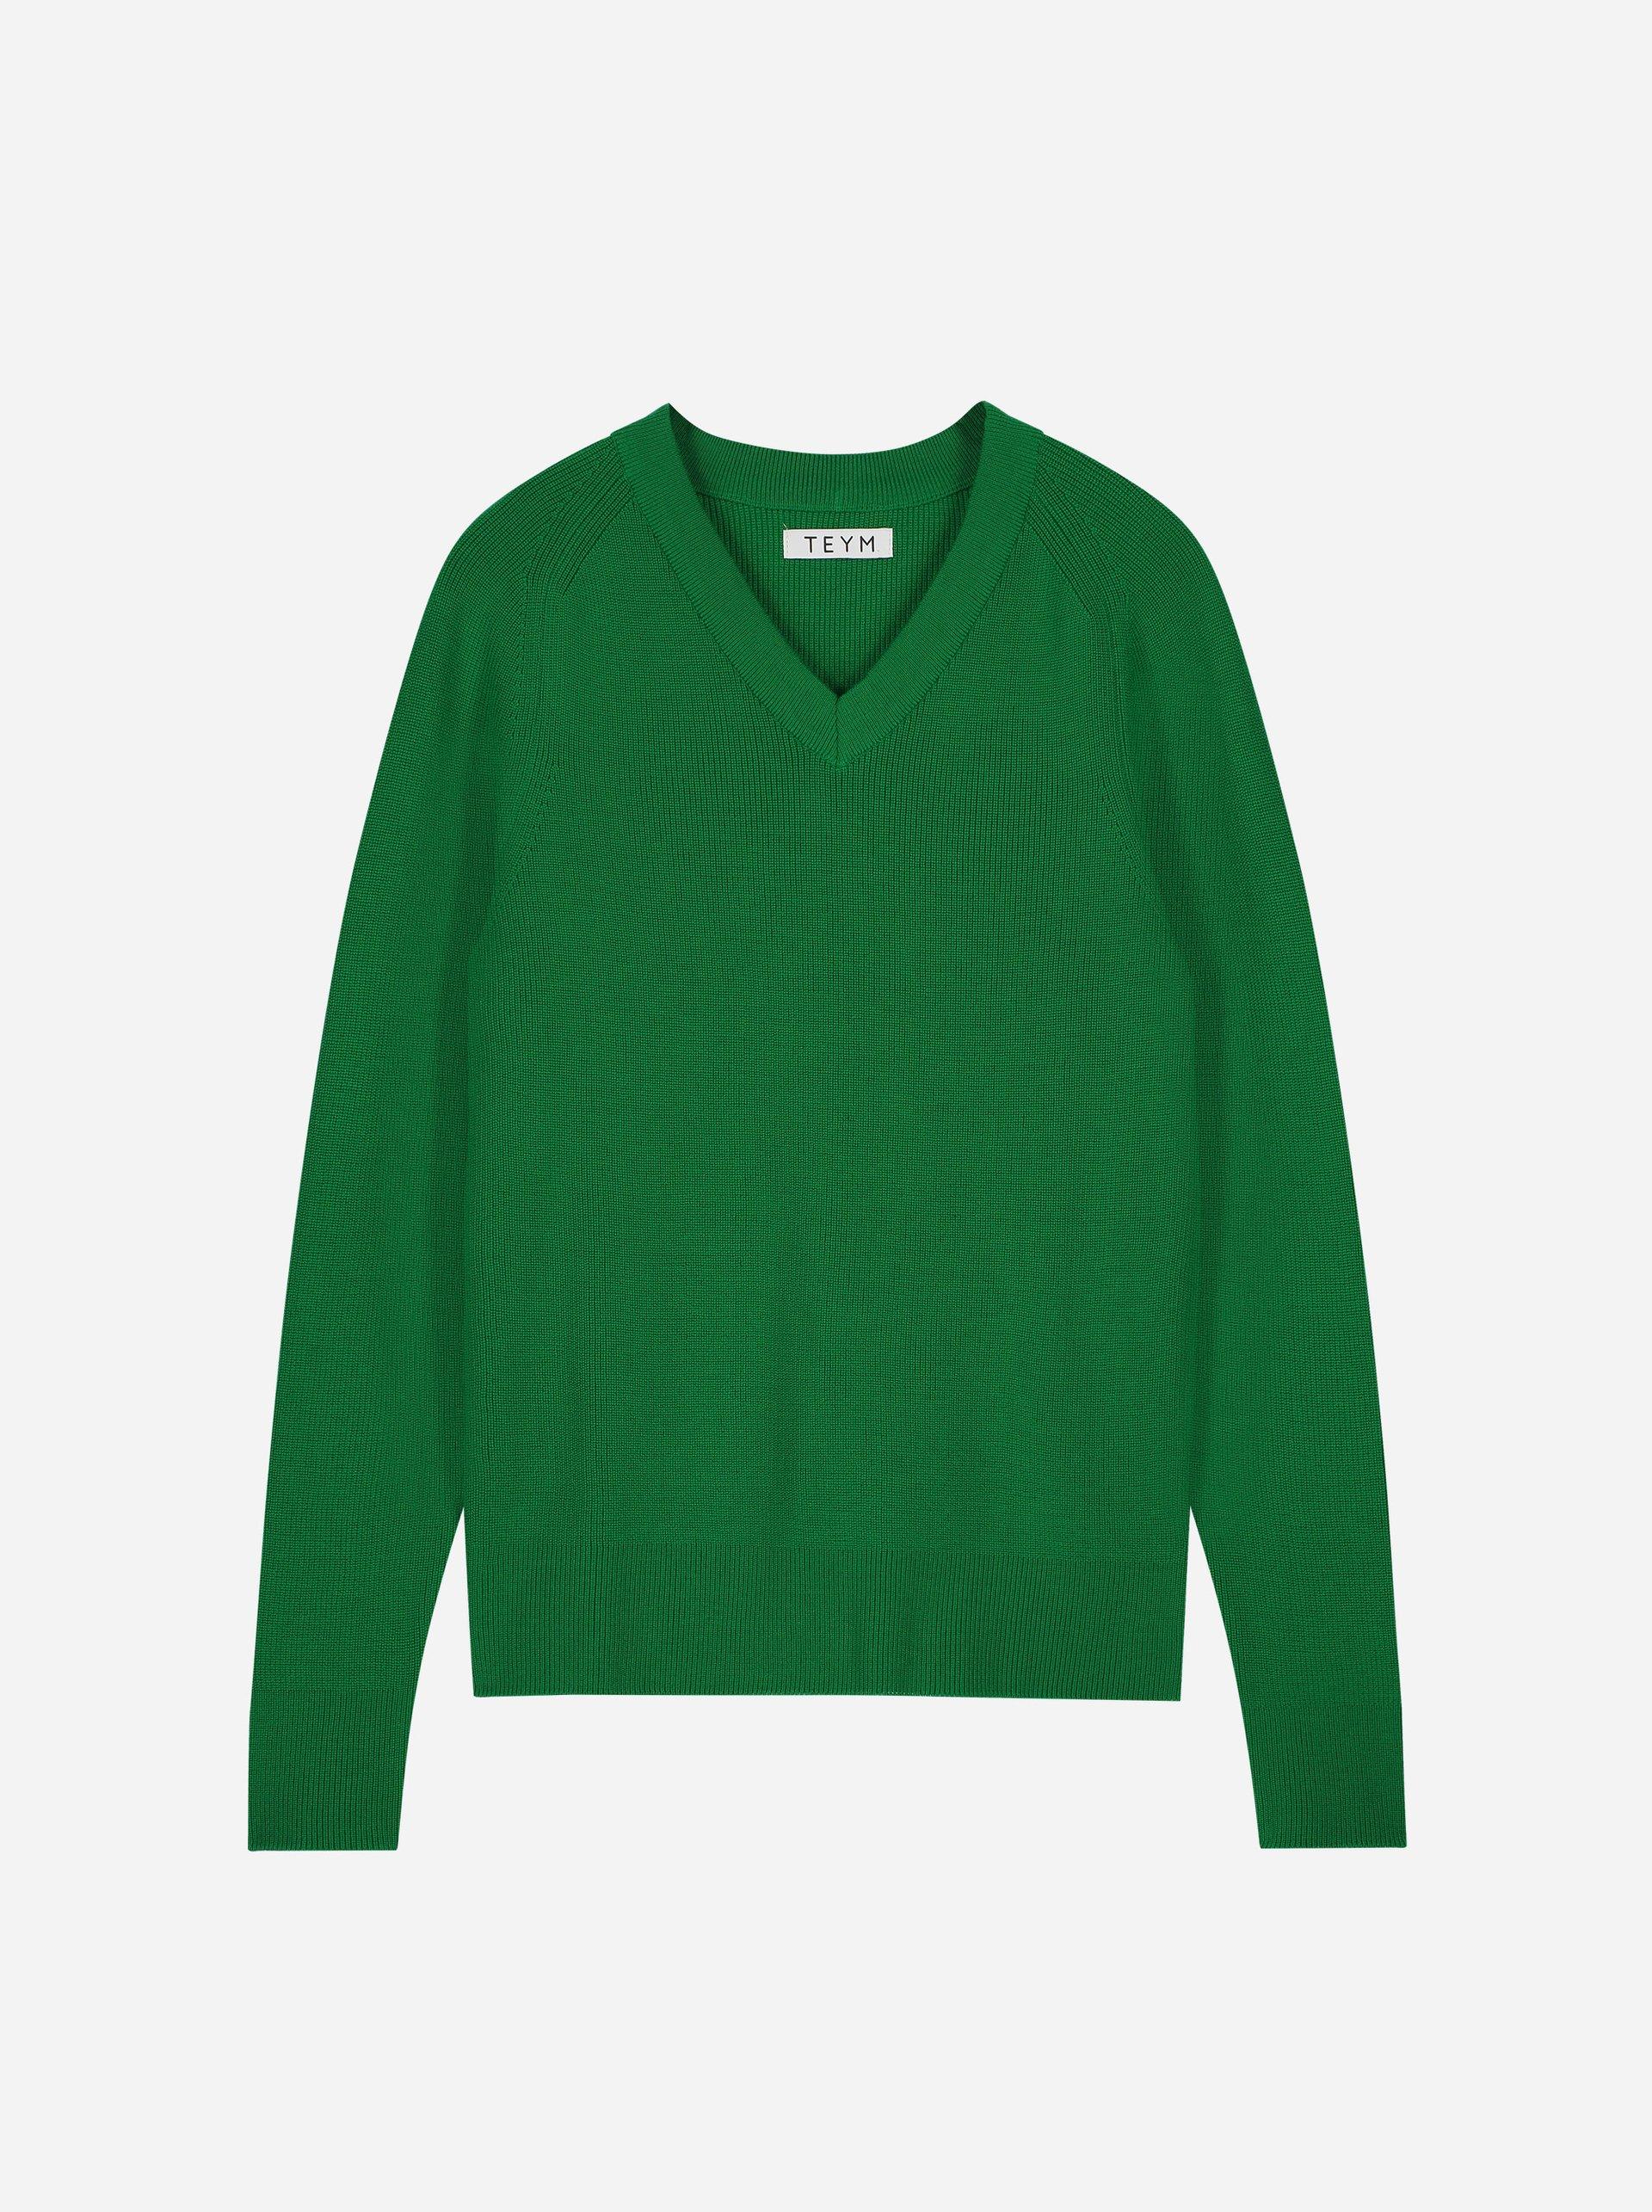 Teym - V-Neck - The Merino Sweater - Women - Bright Green - 4